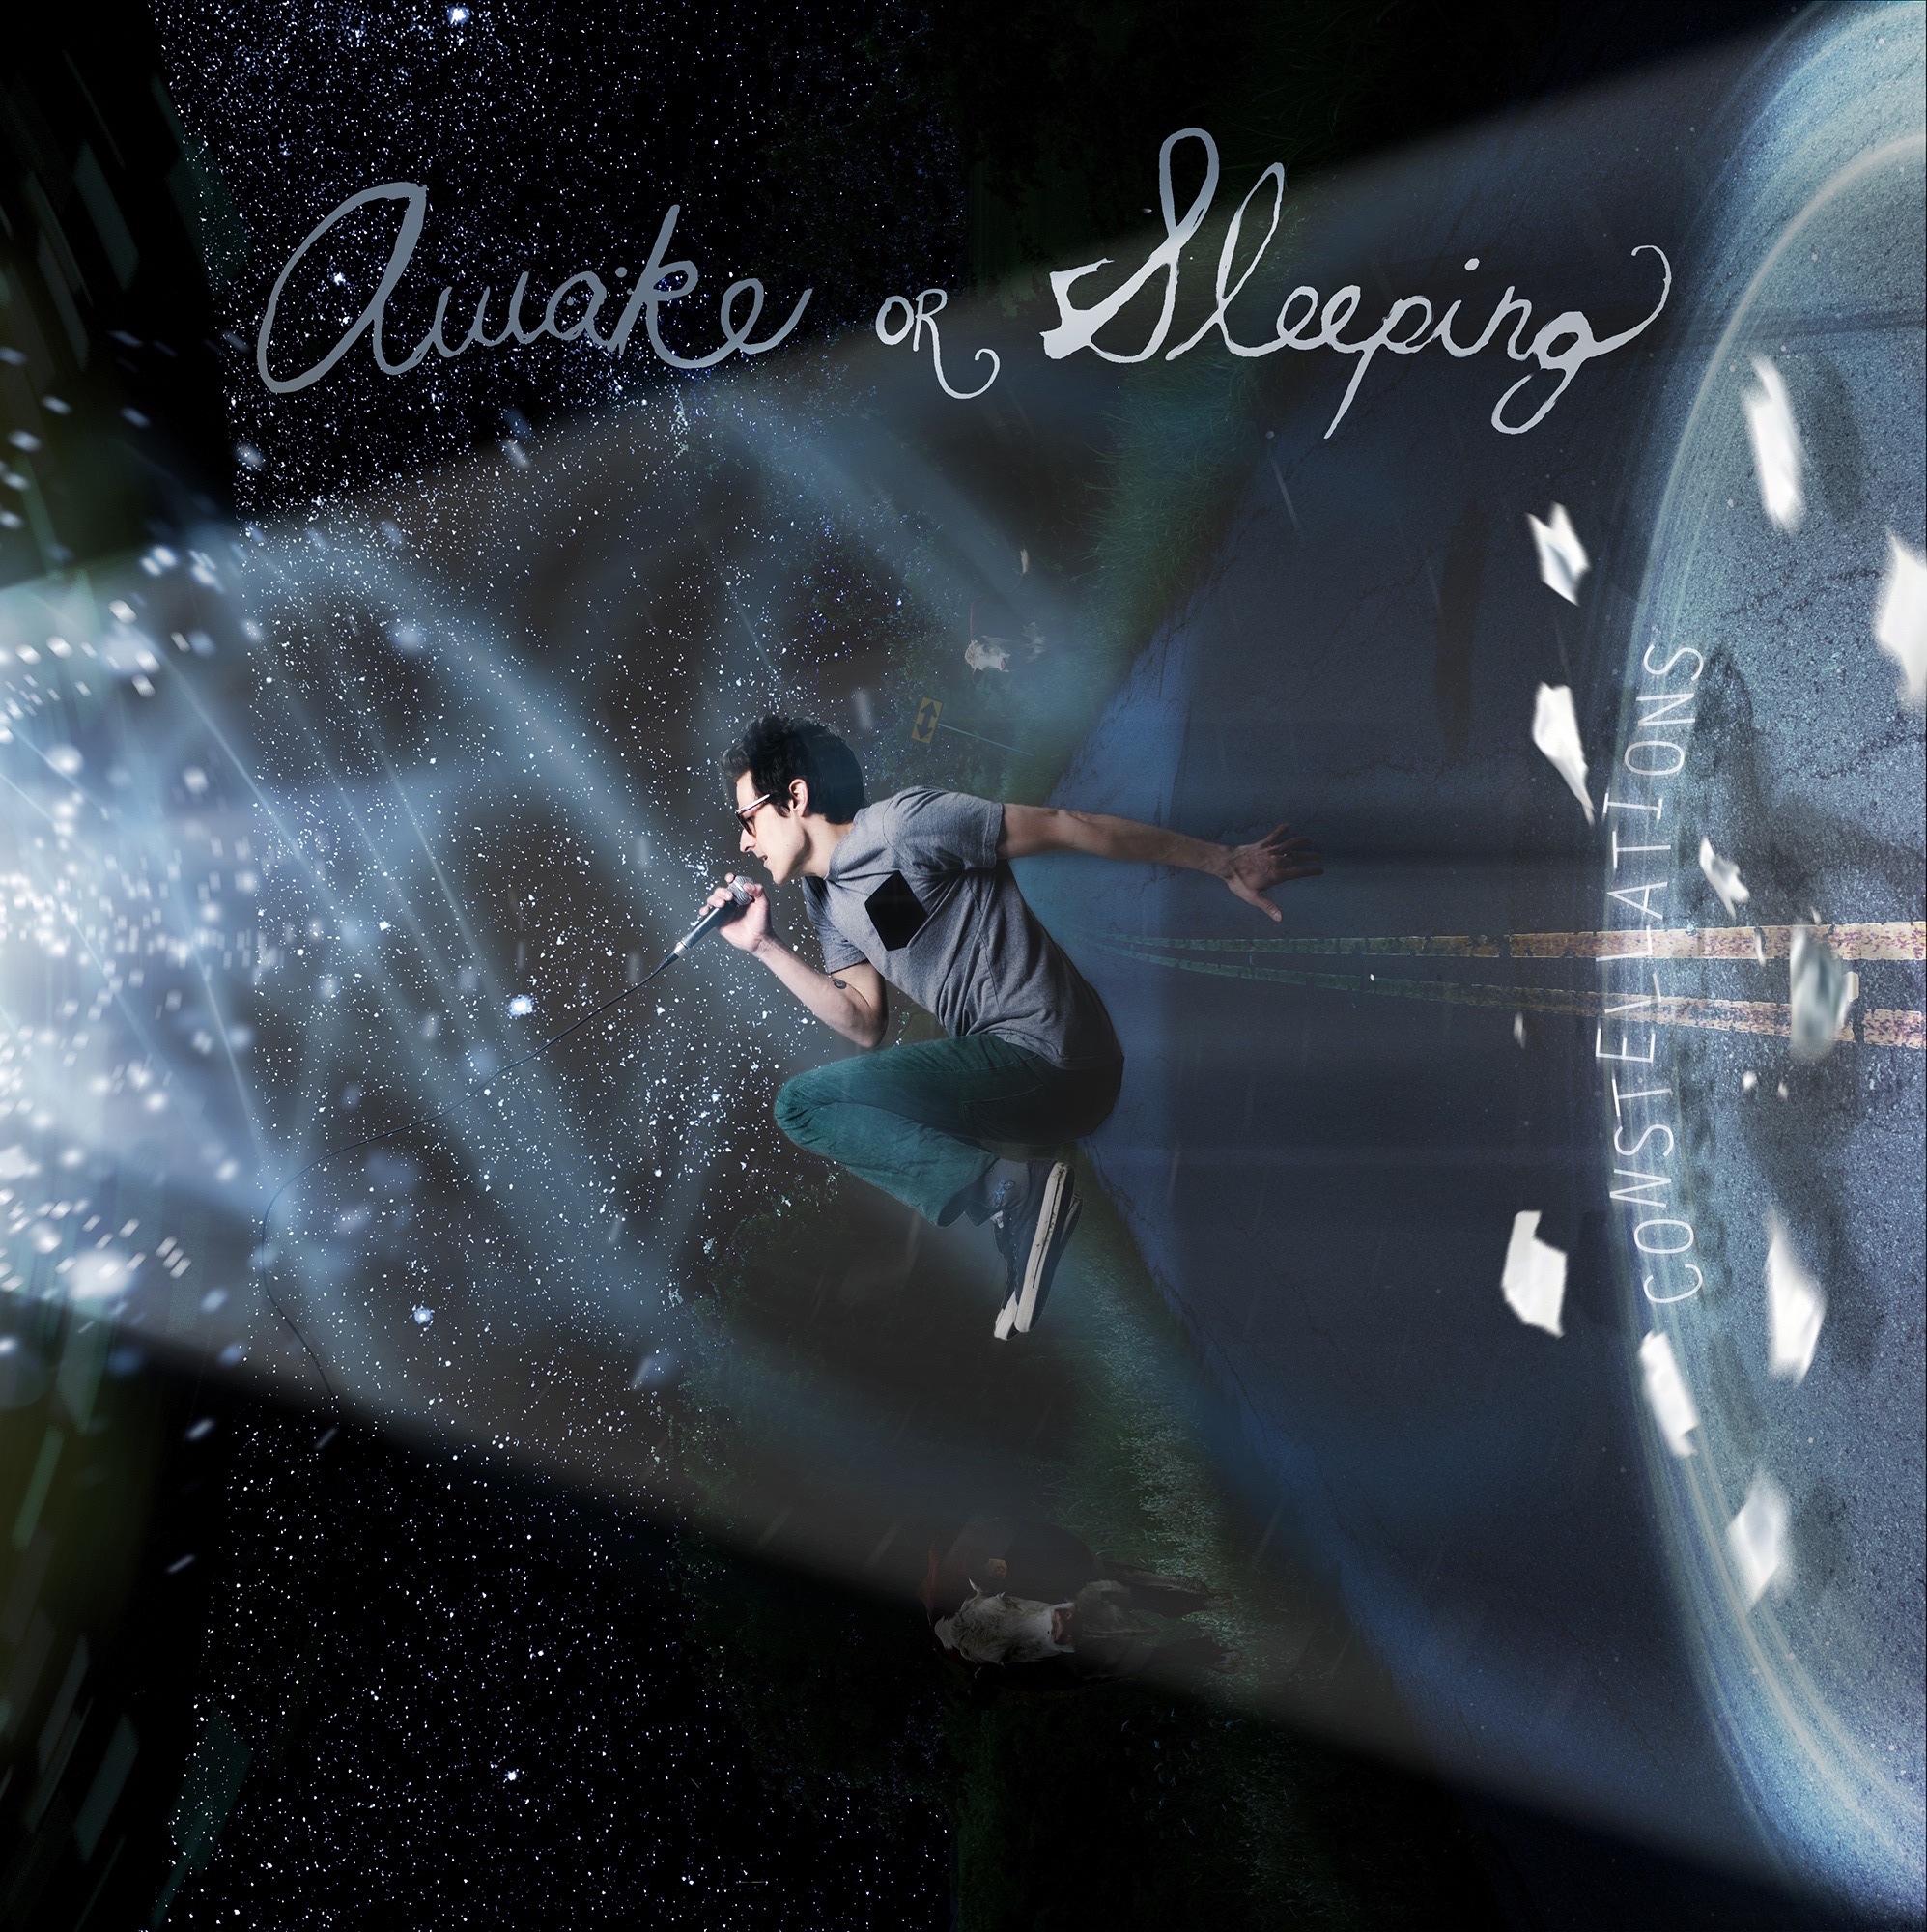 Awake-or_Sleeping-Constellations.jpg